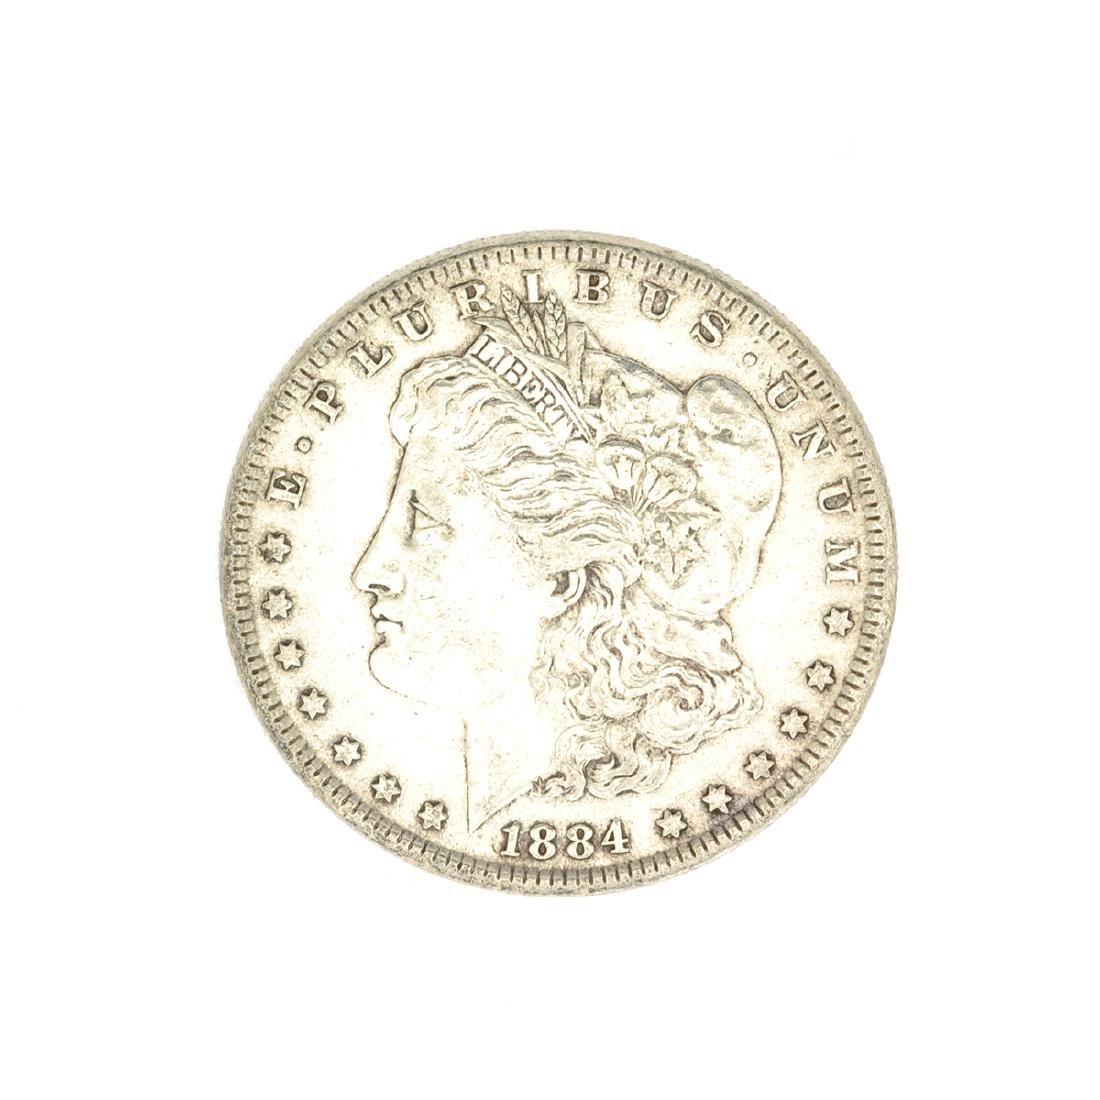 1884 U.S. Morgan Silver Dollar Coin